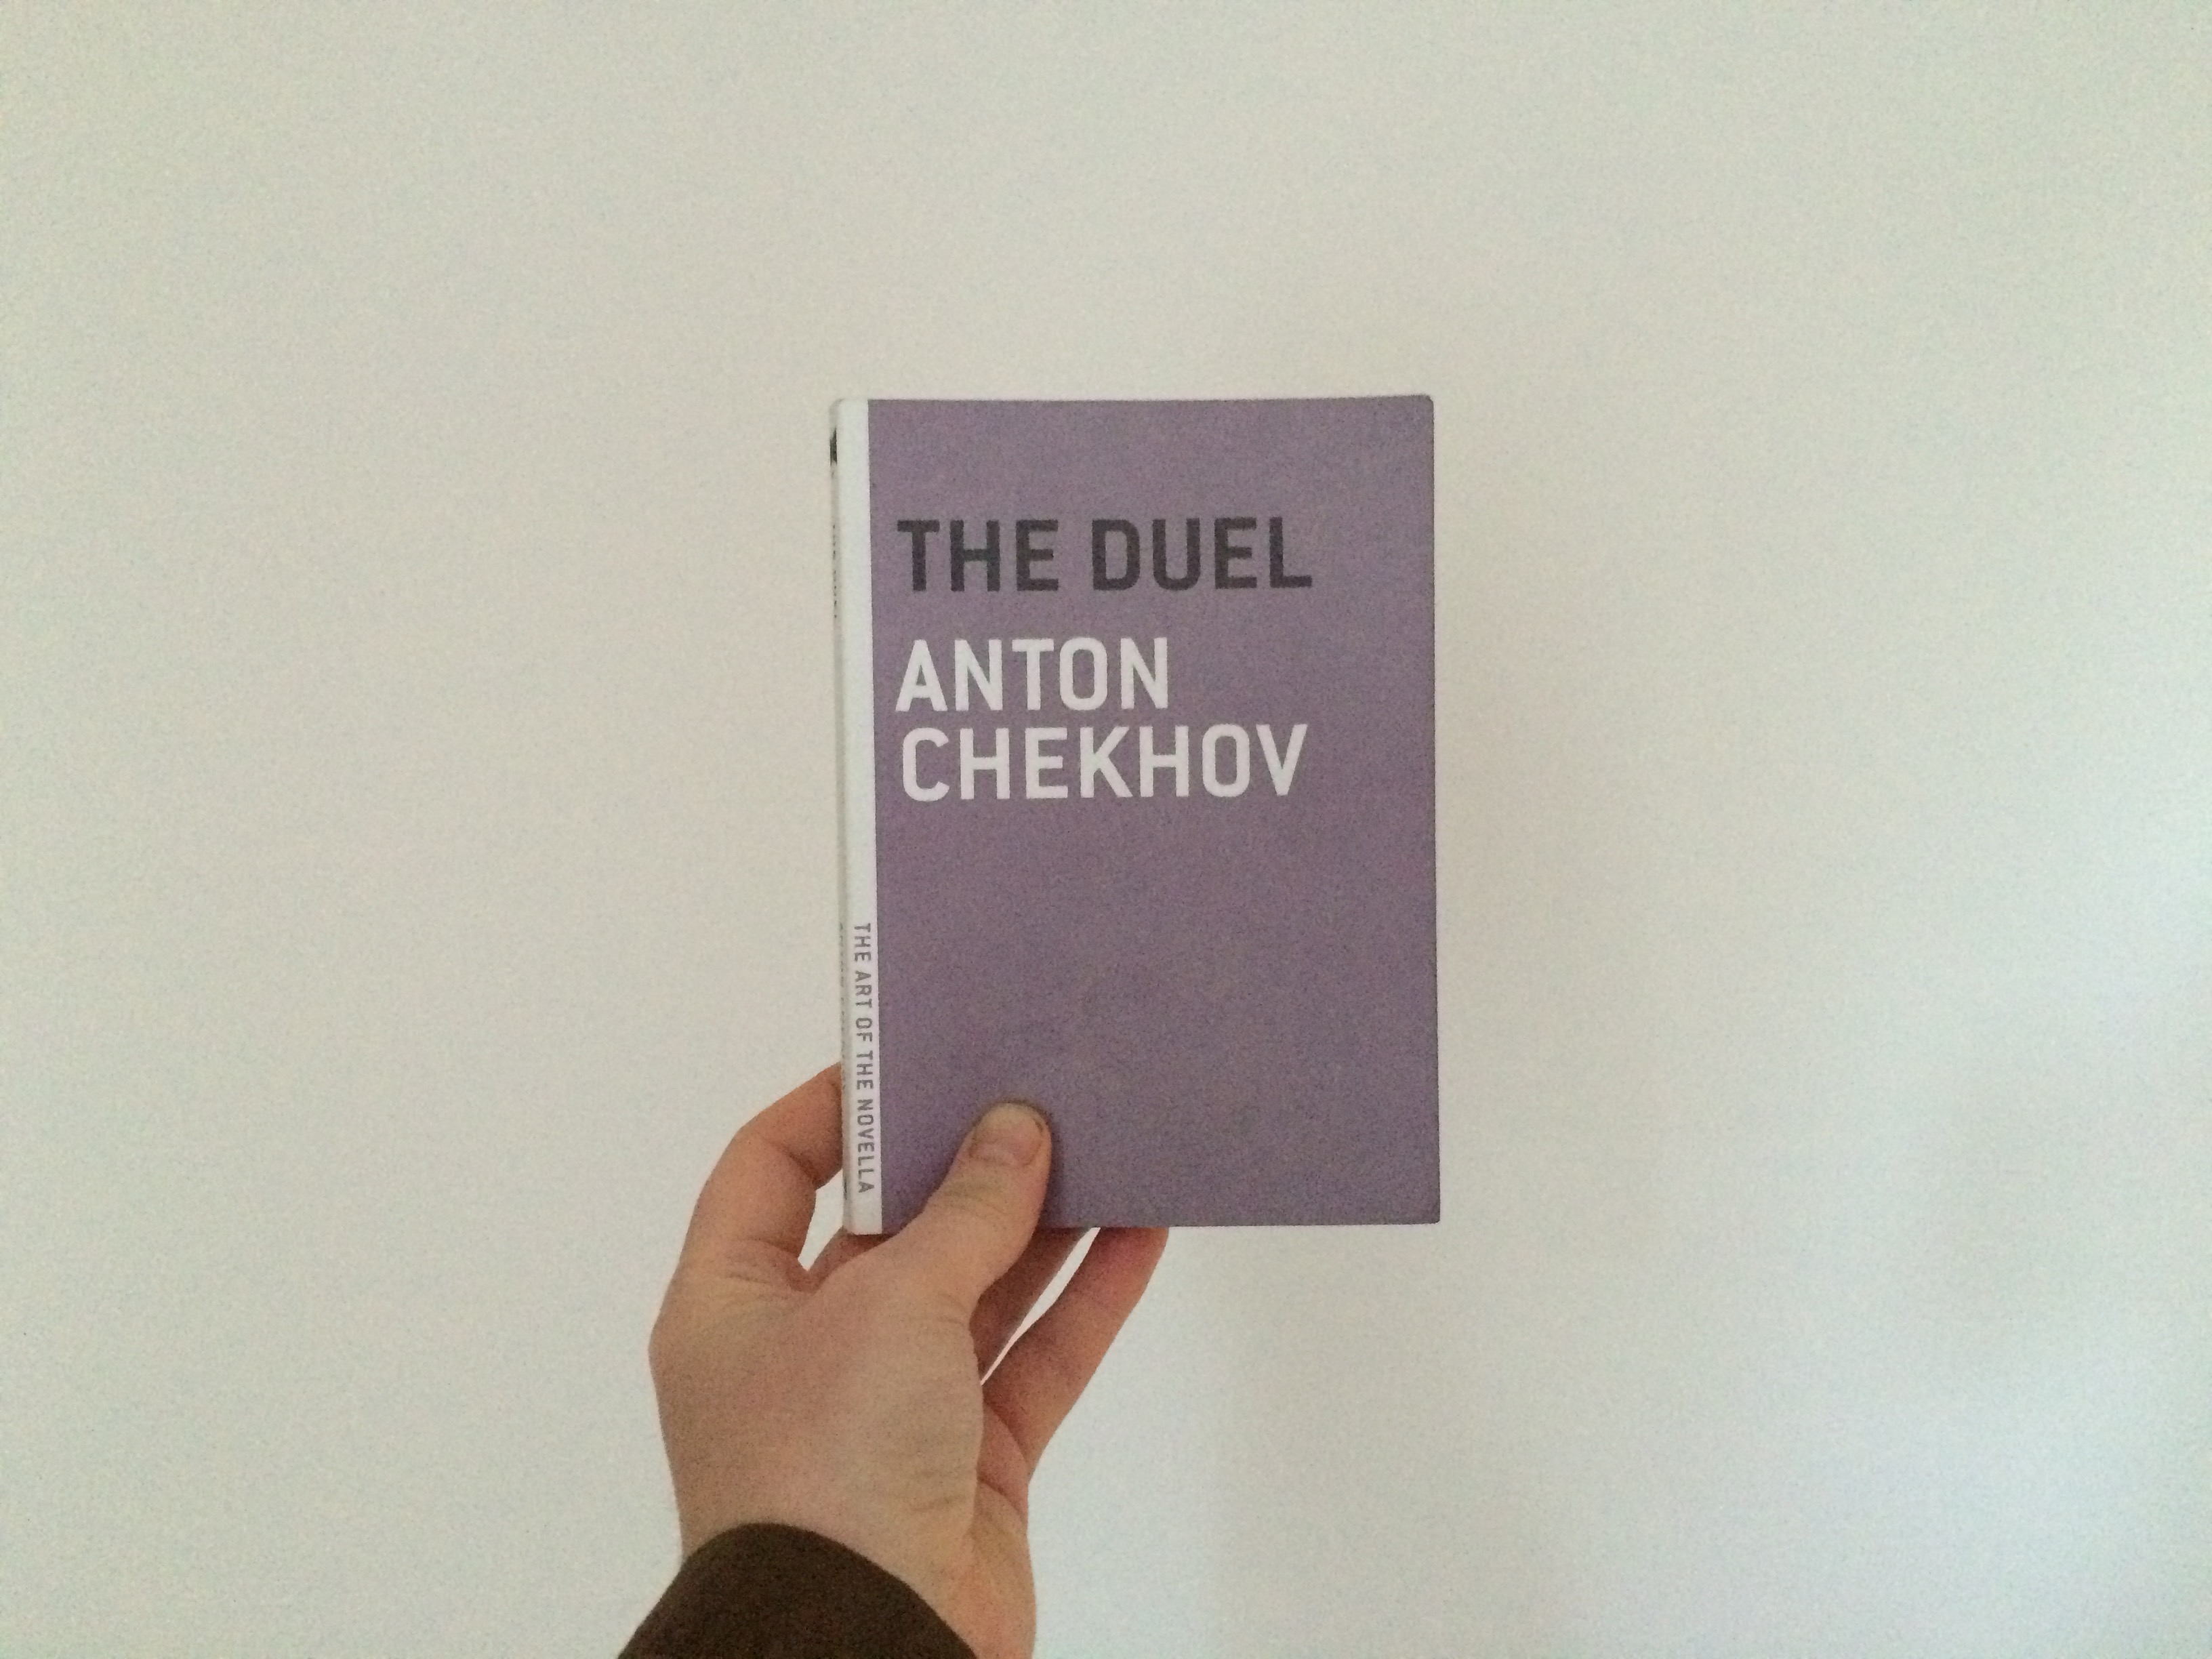 The Art of the Novella challenge 25: The Duel (Chekhov)